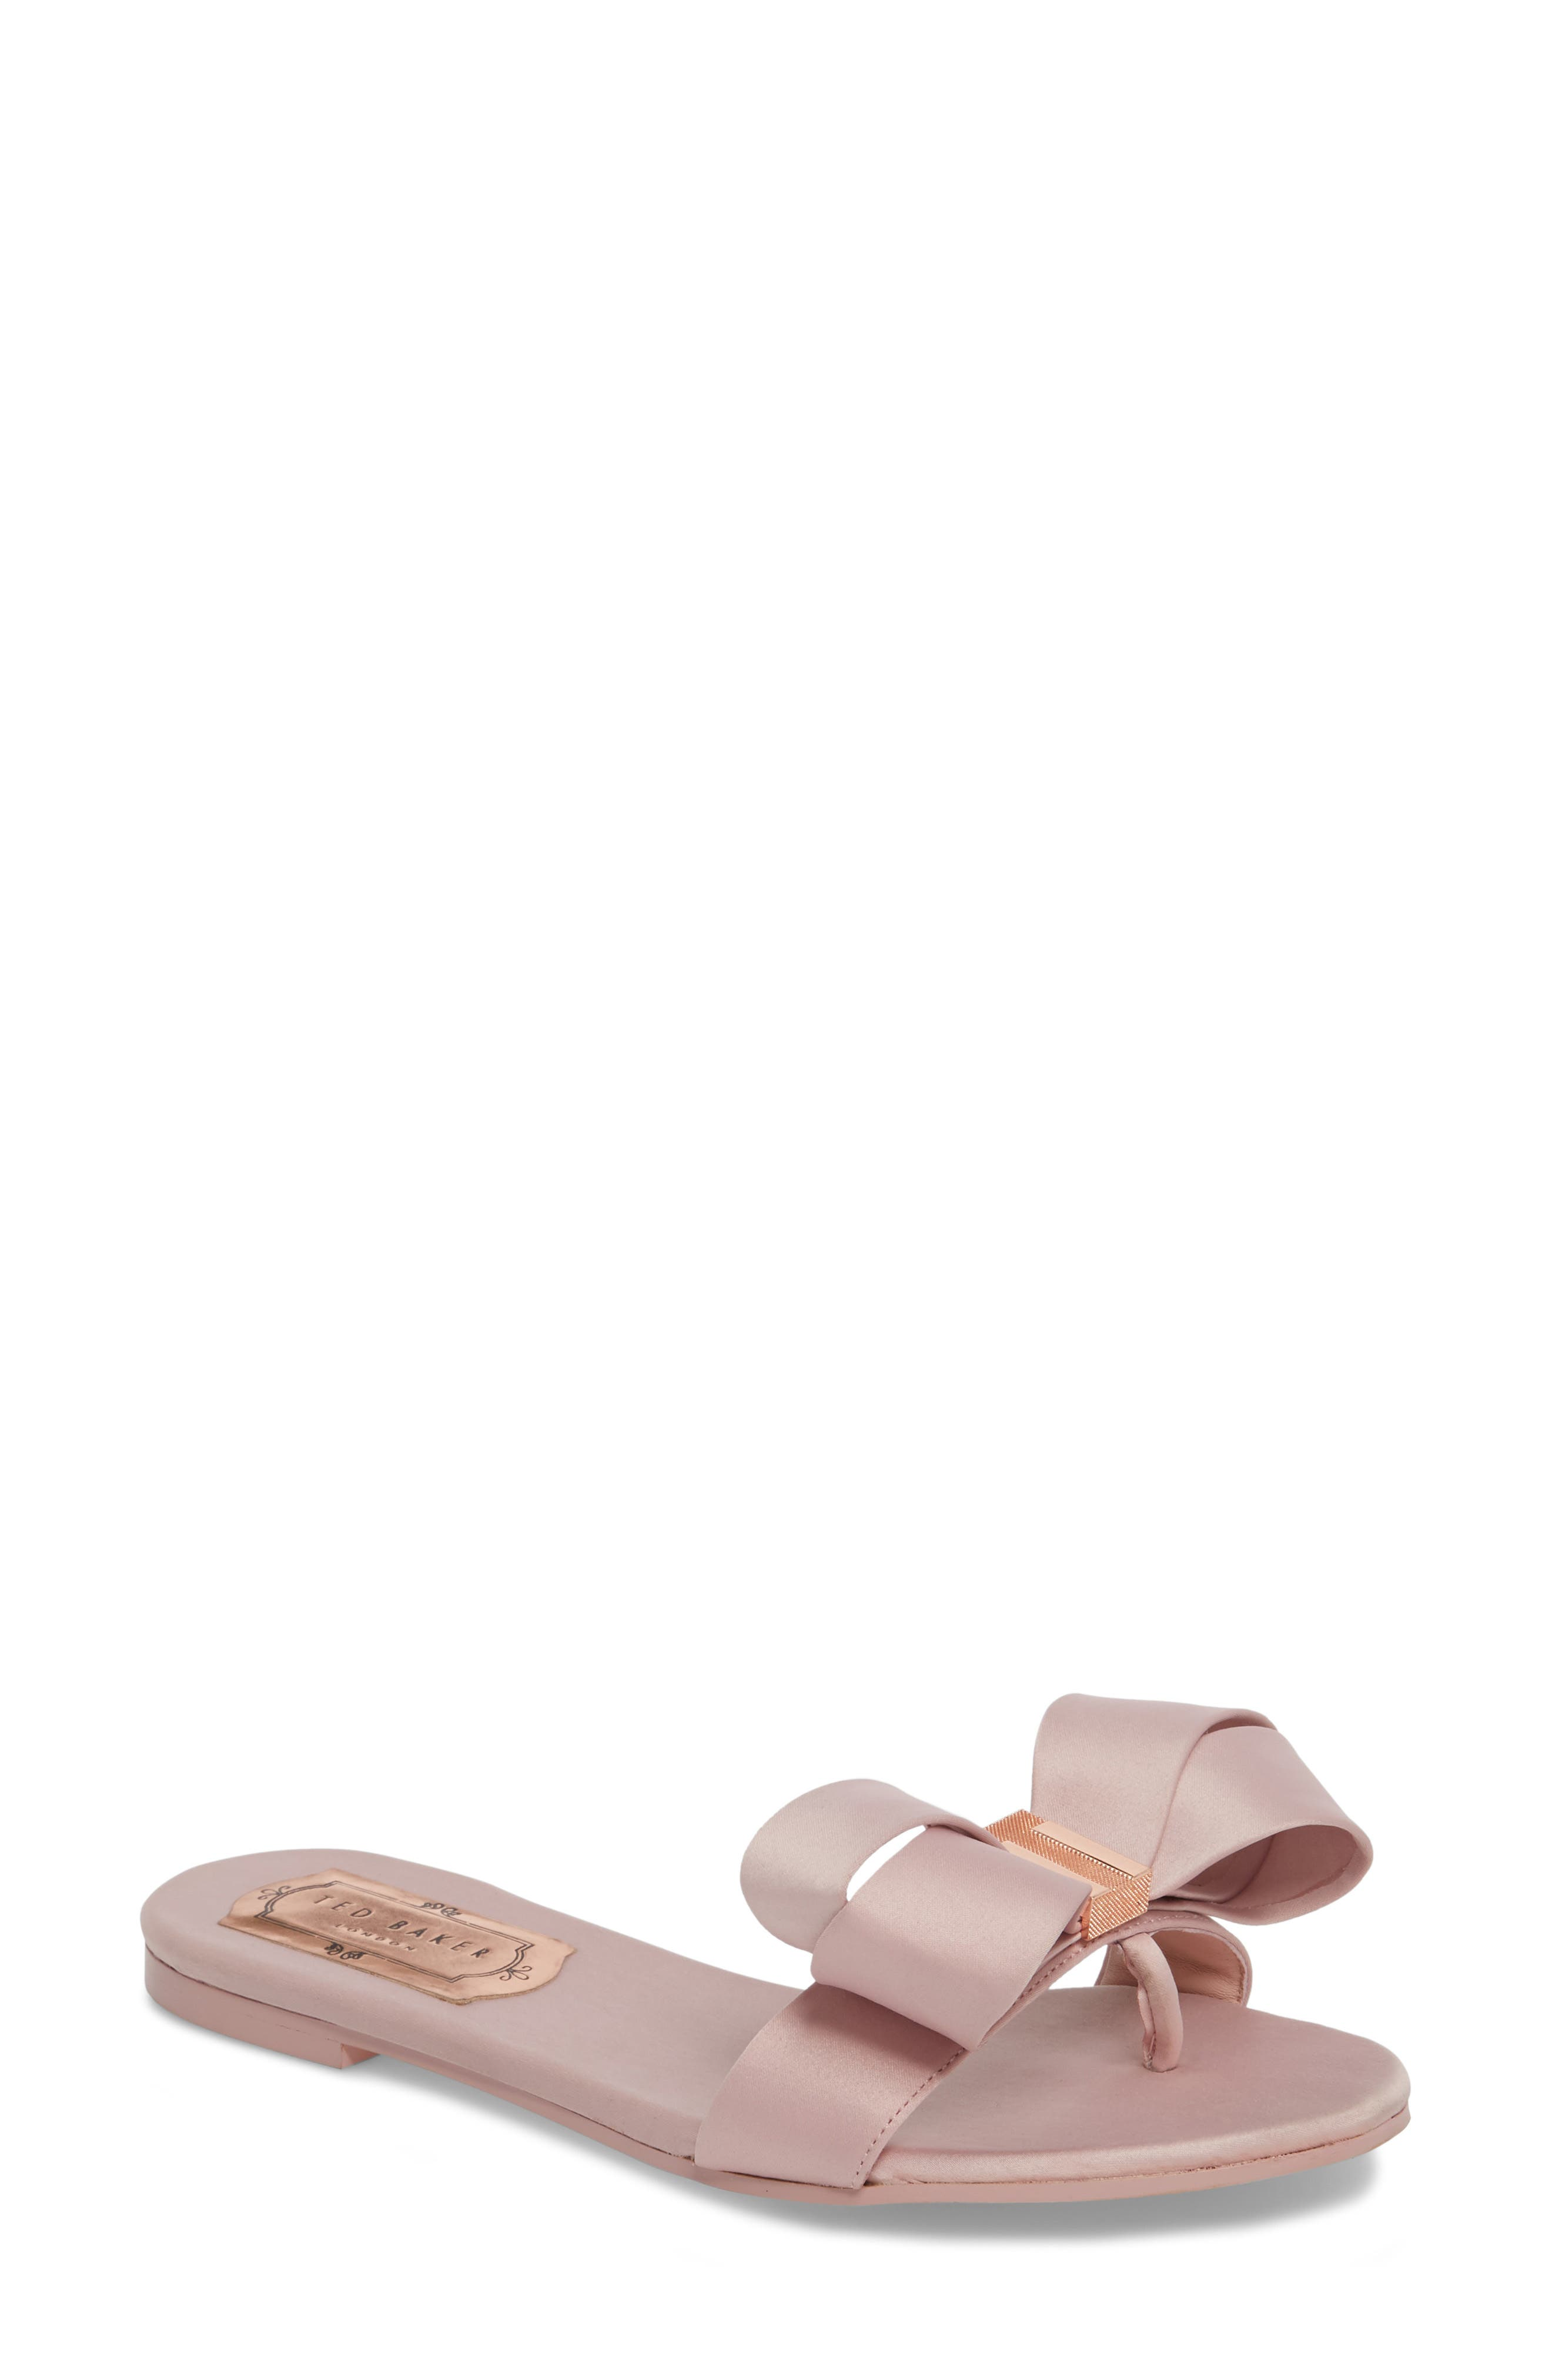 Ted Baker London Slide Sandal- Pink